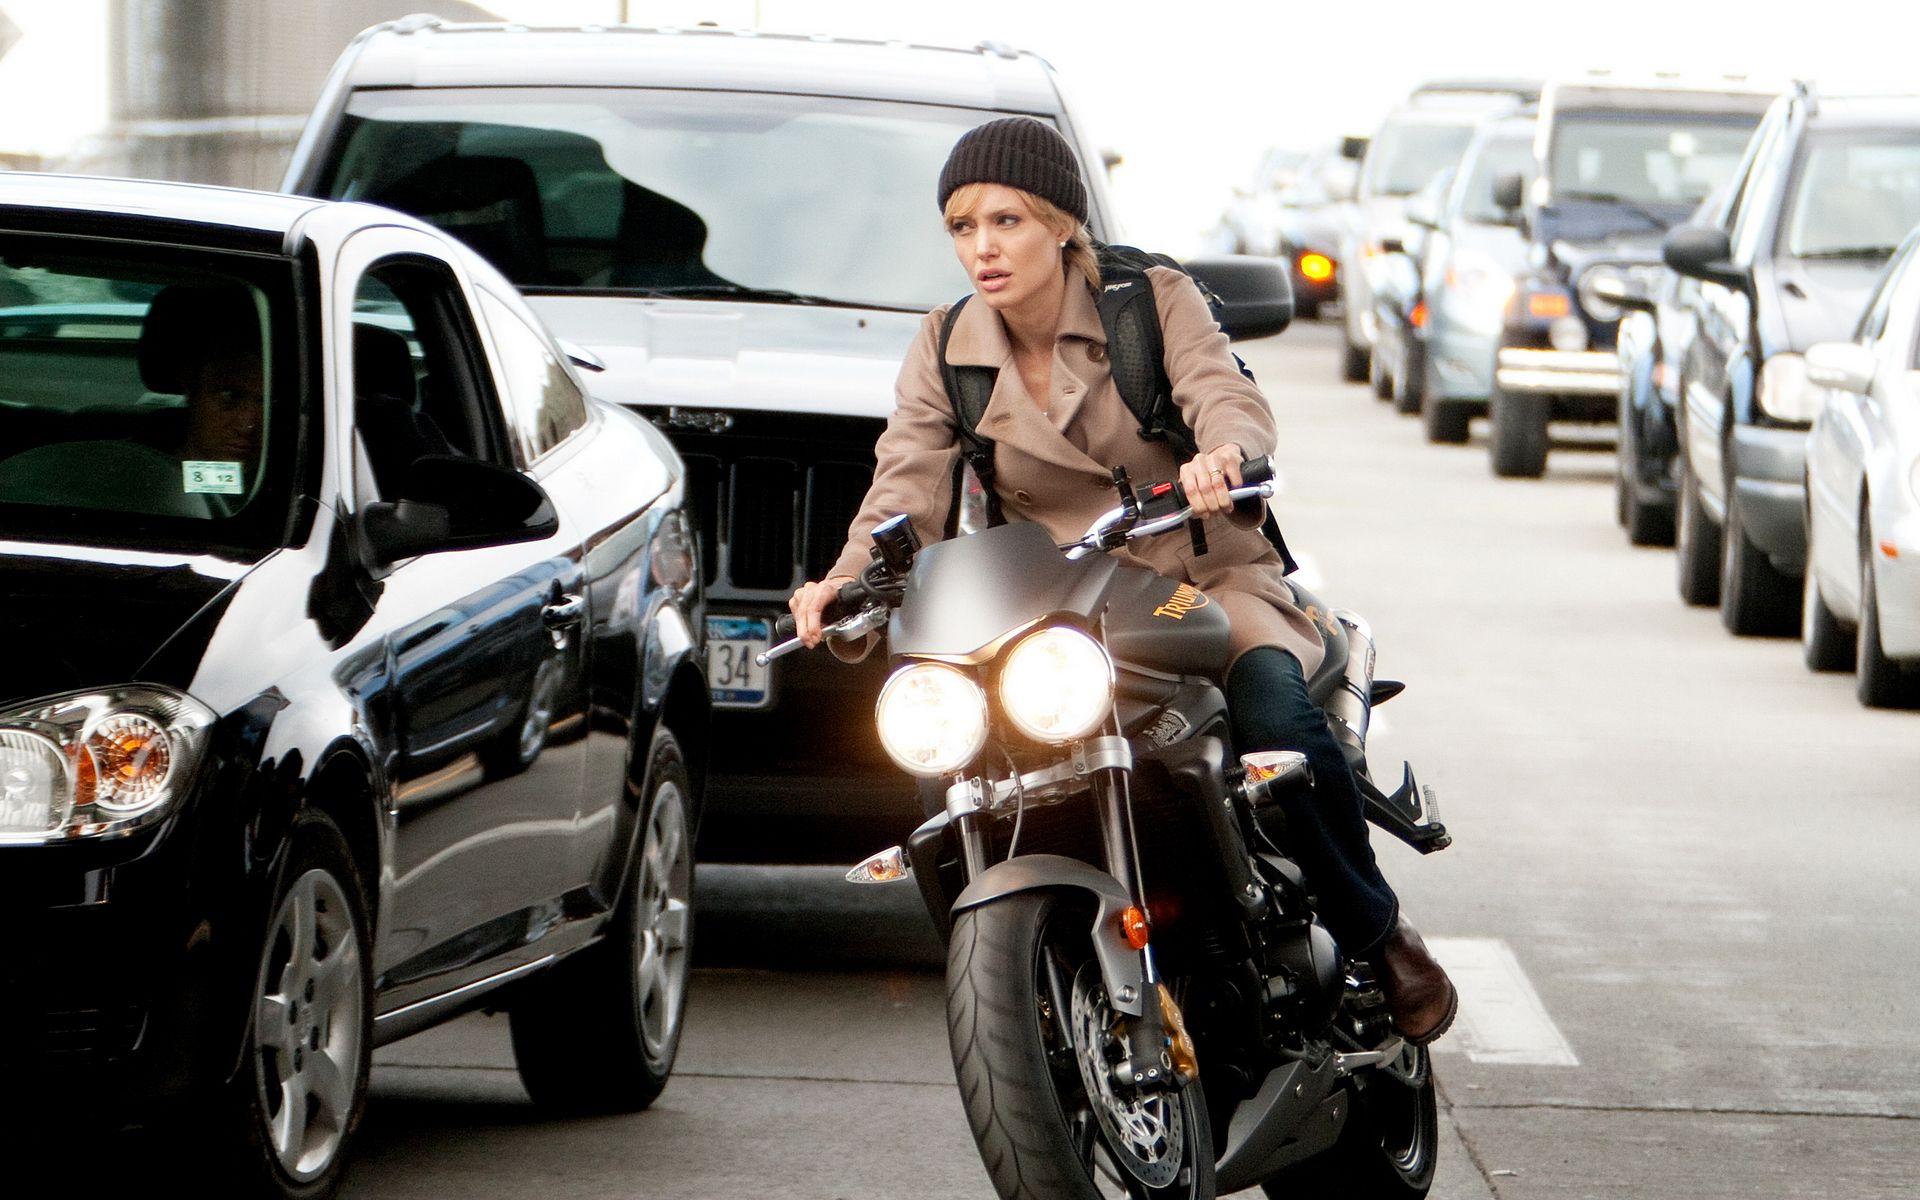 angelina jolie on a 2009 triumph street triple r motorcycle in the movie salt